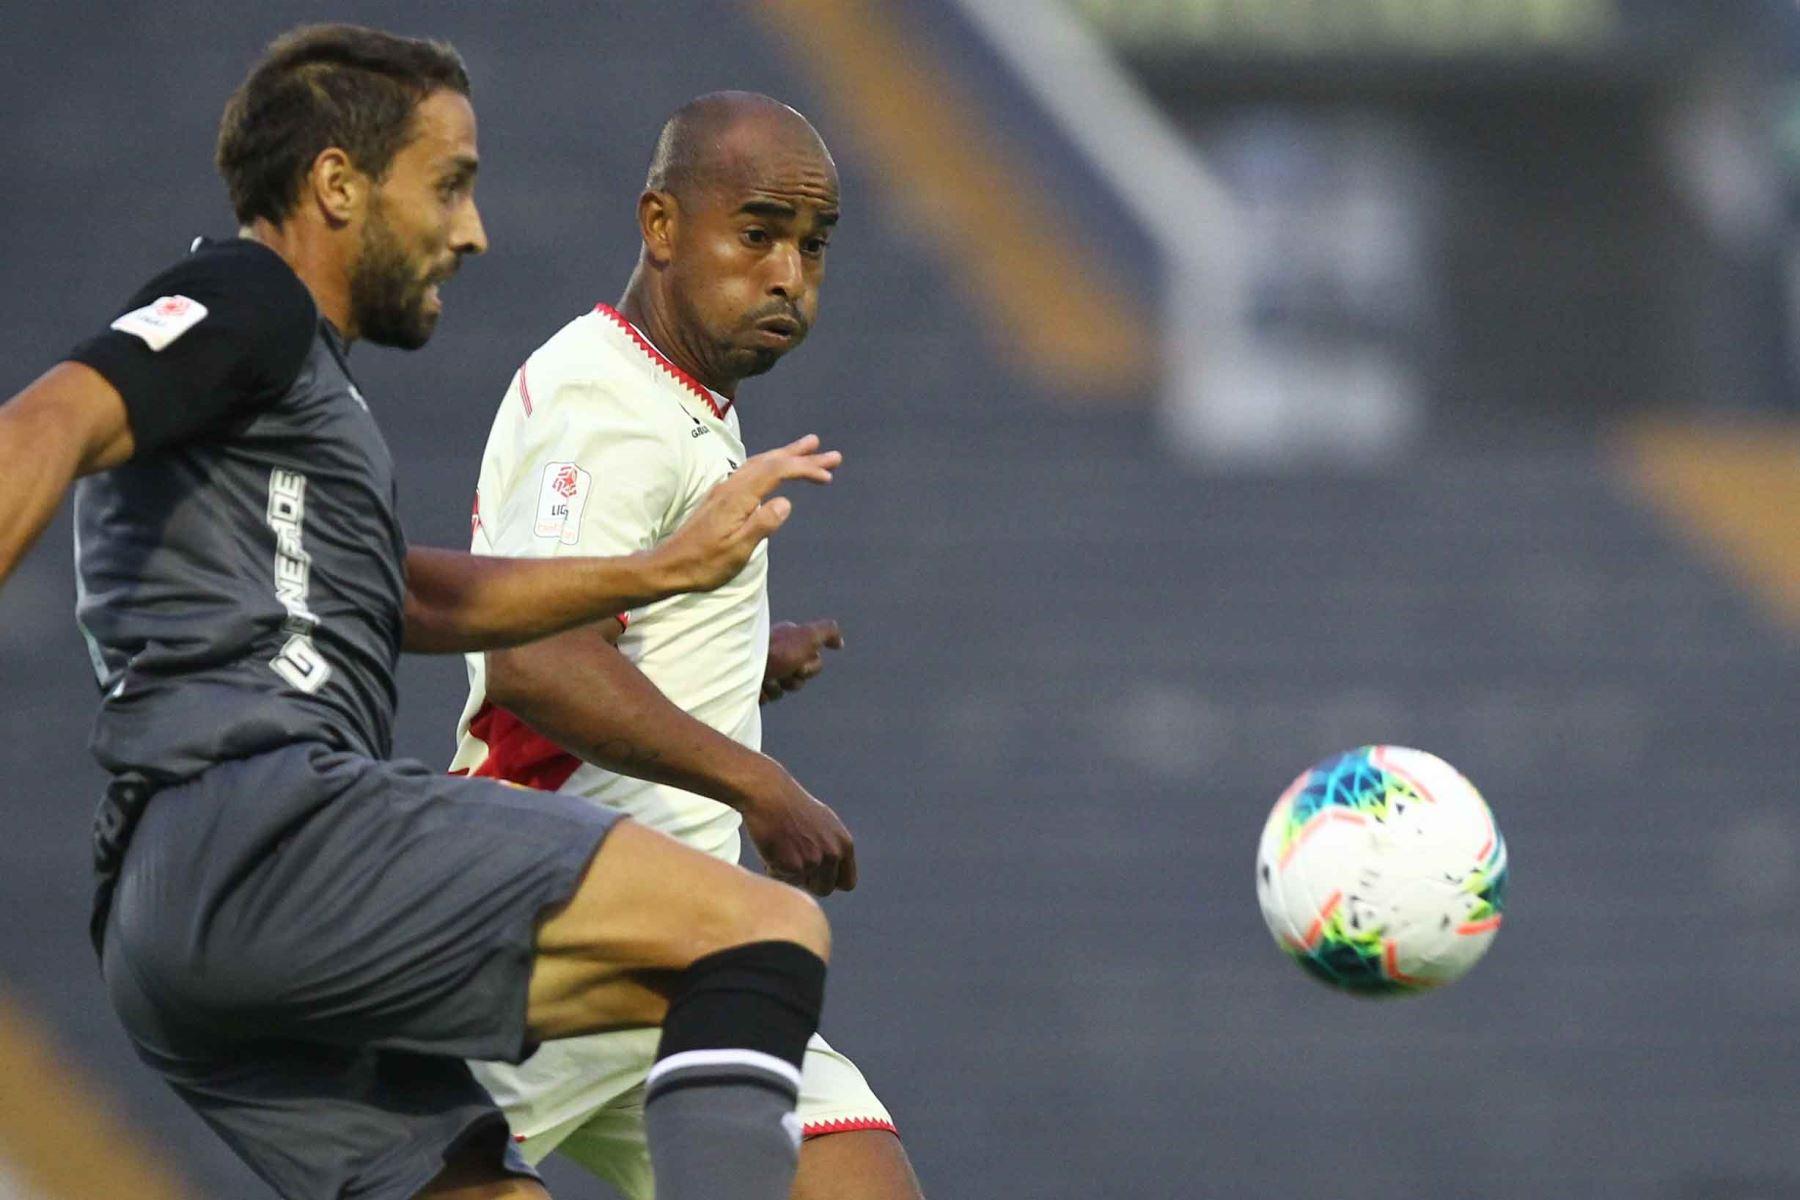 UTC choca ante Melgar por la cuarta fecha de la Liga 1, en el estadio Iván Elías Moreno. Foto: Liga 1